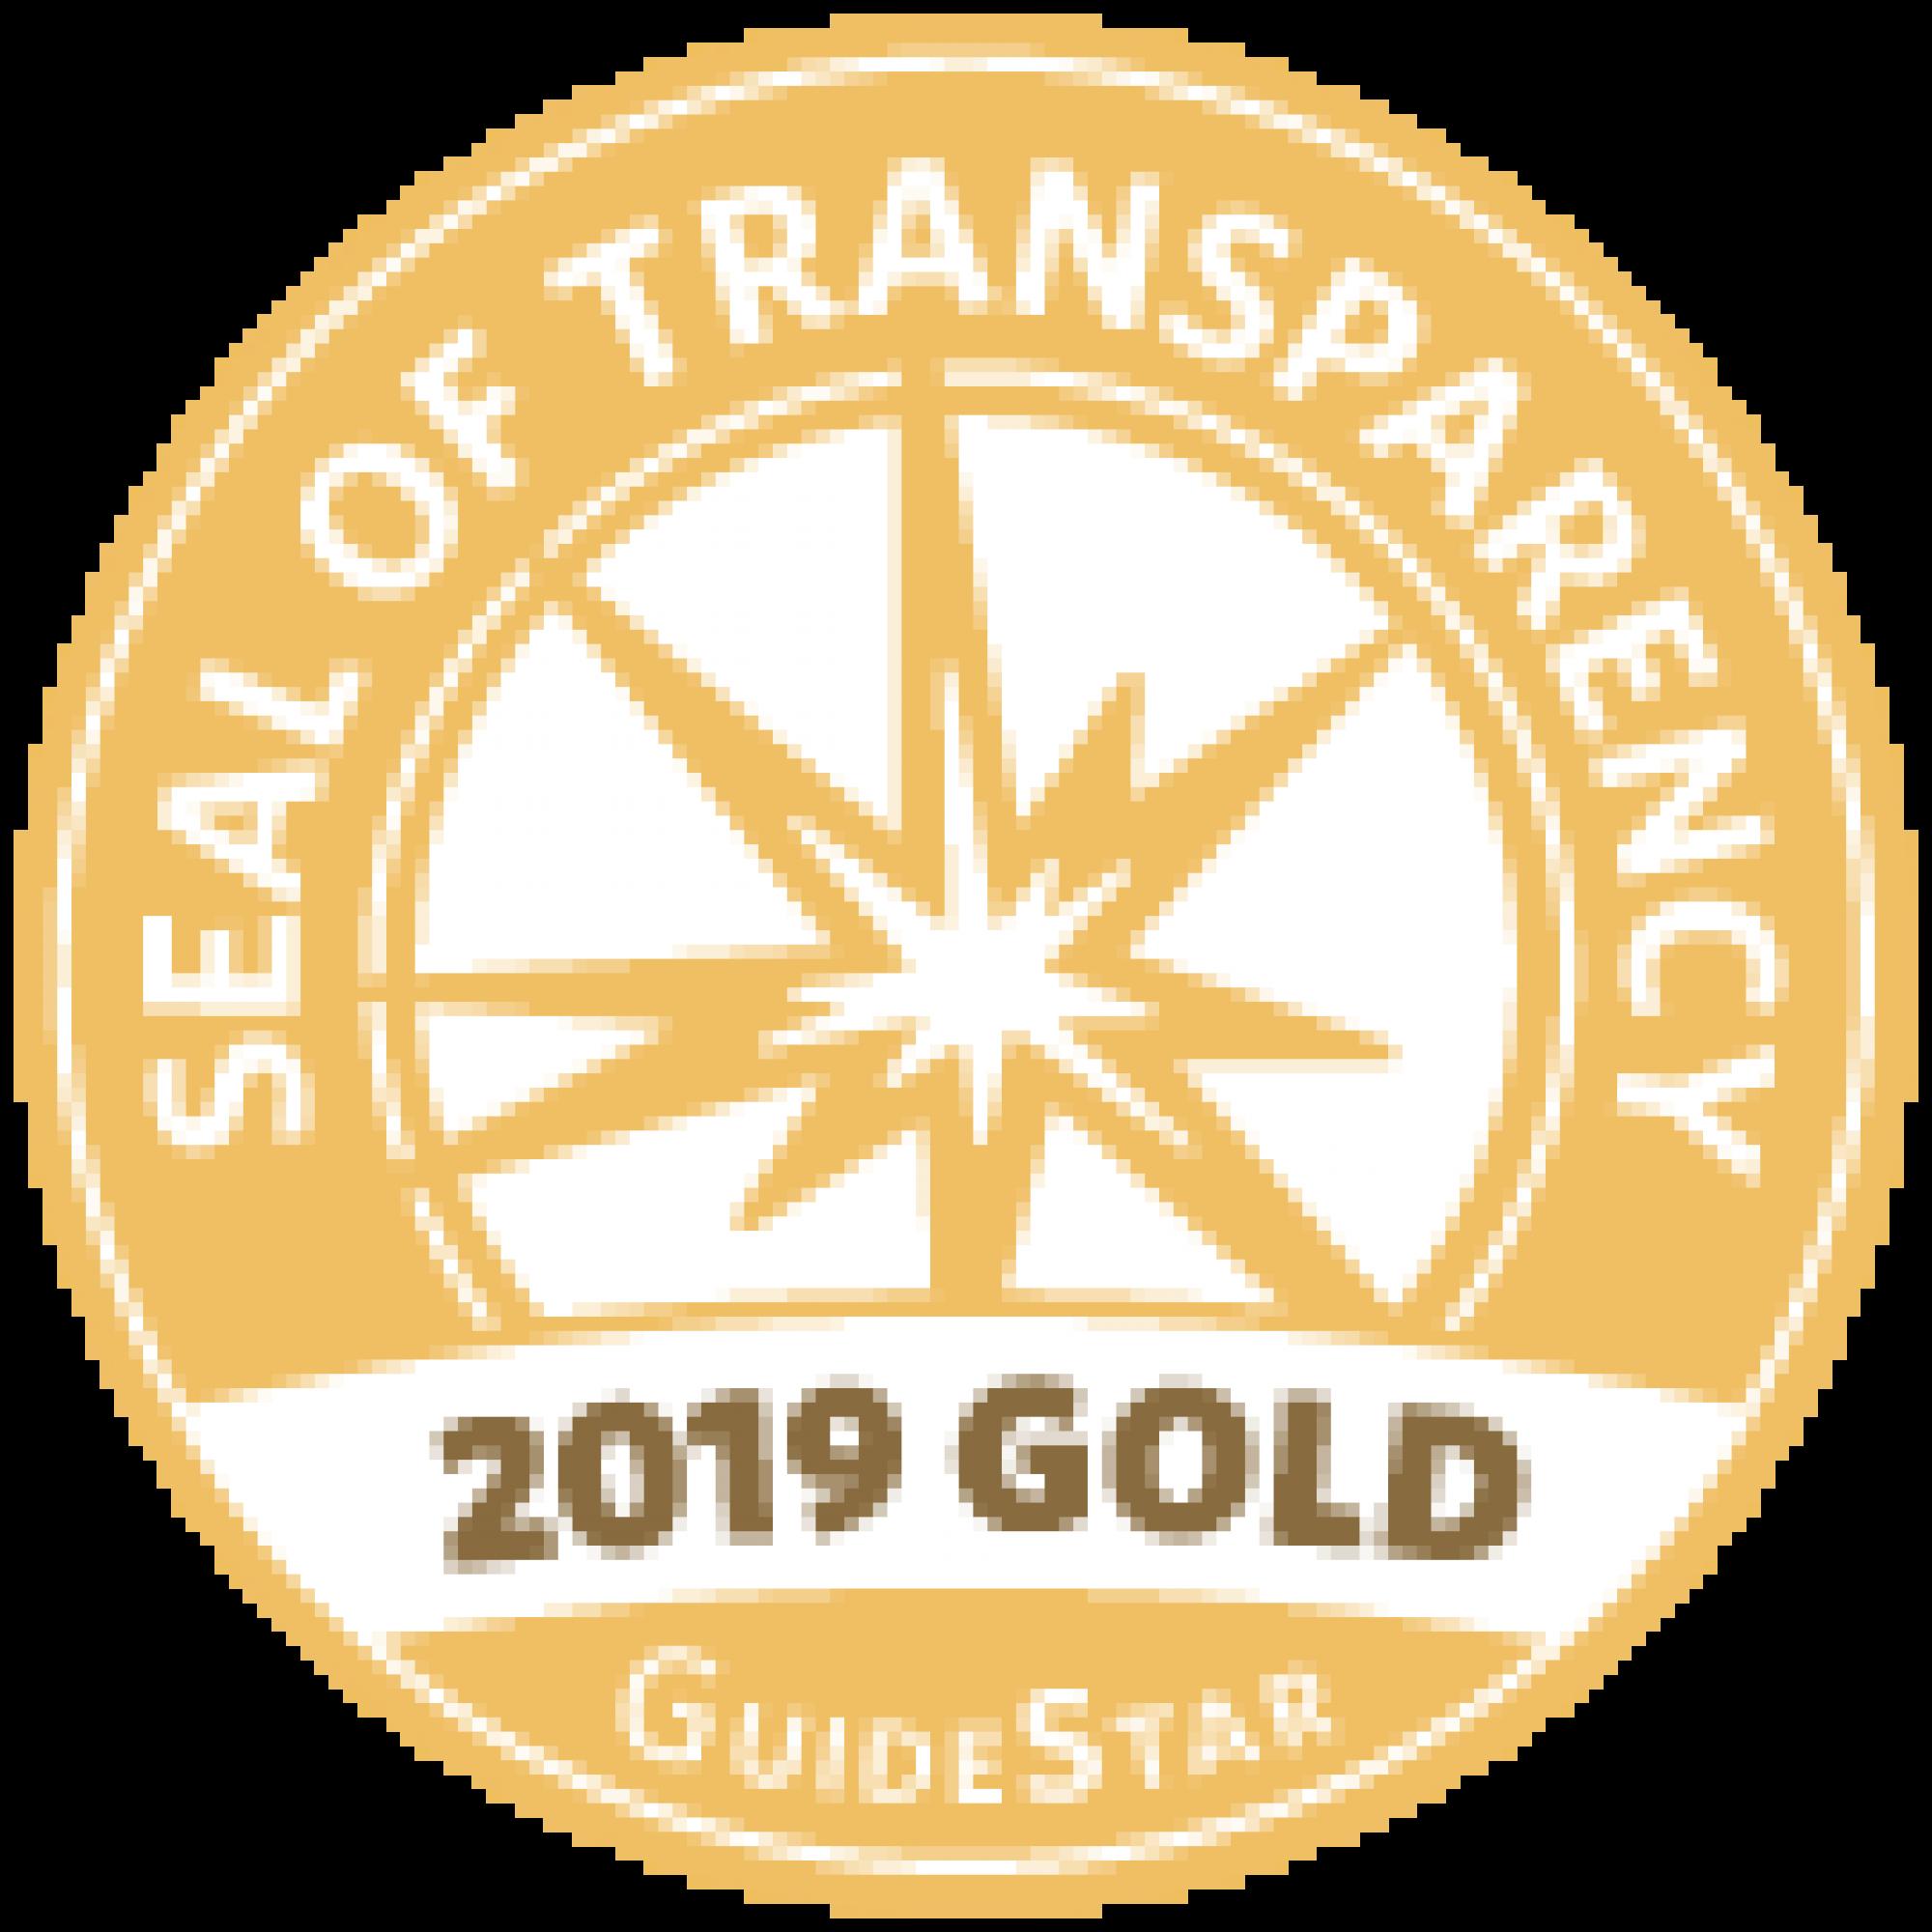 gold star 2019